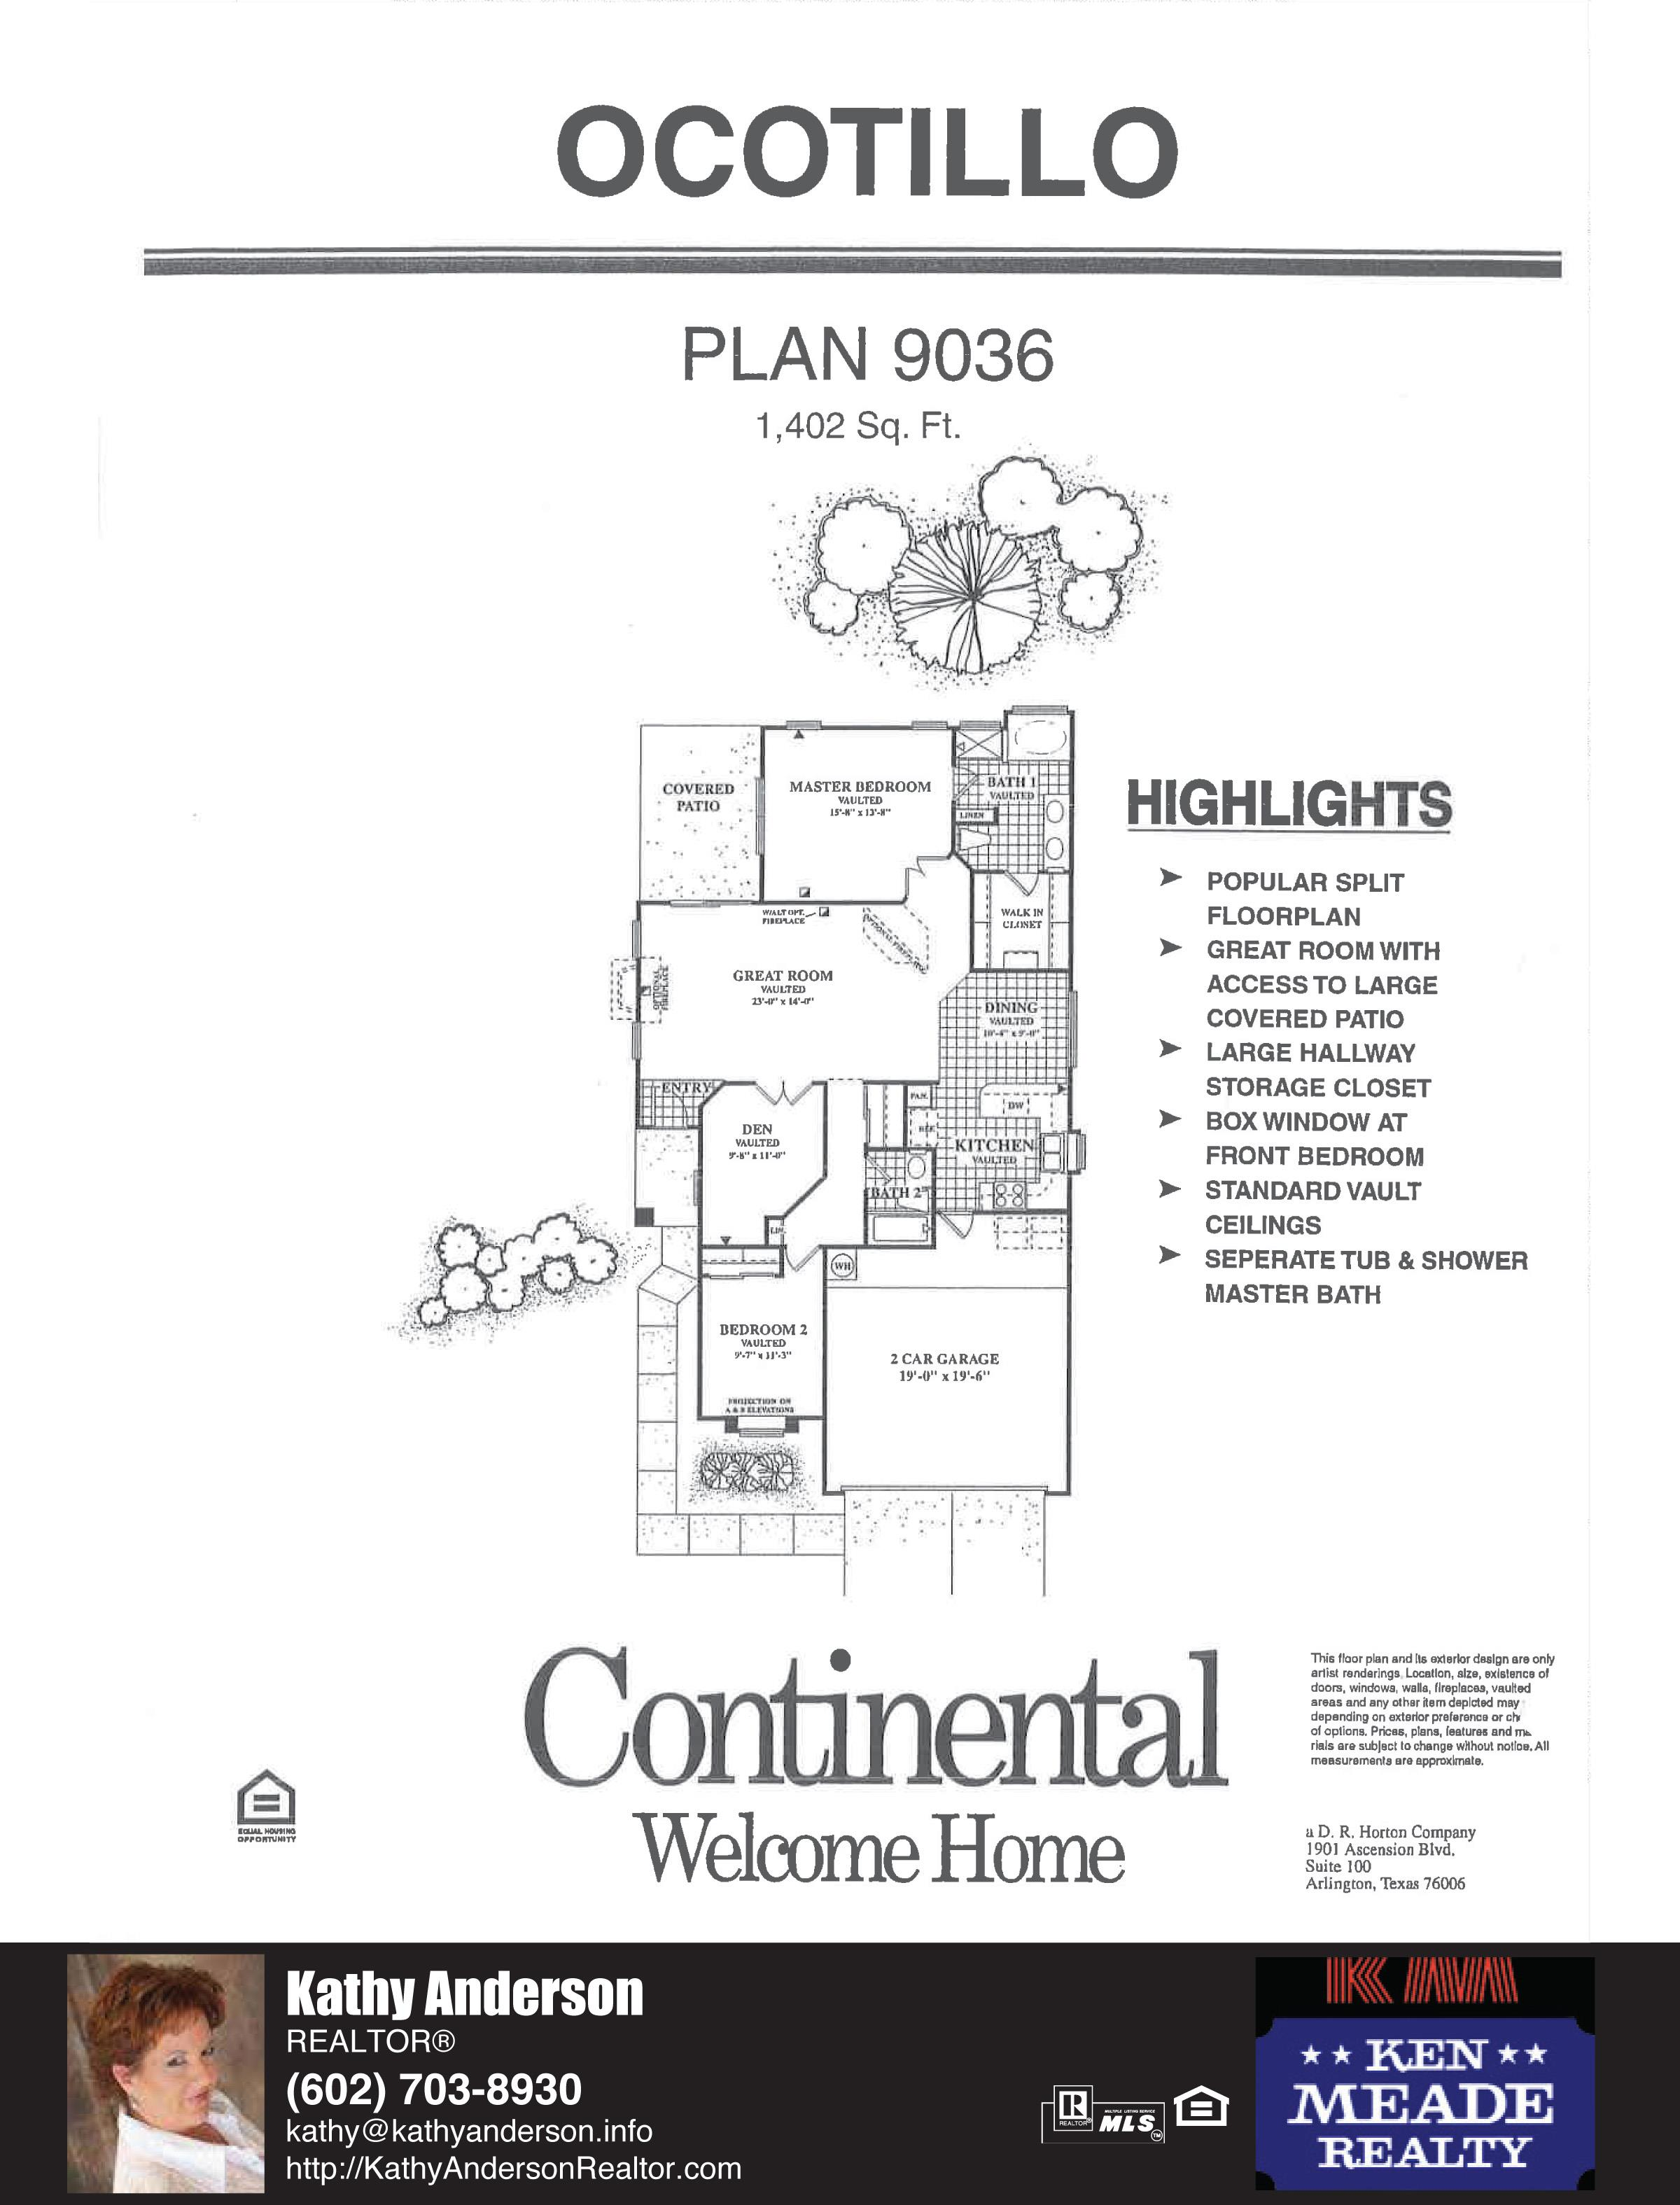 Arizona Traditions Ocotillo Floor Plan Model Home Plans Floorplans Models in Surprise Arizona AZ Top Ken Meade Realty Realtor agent Kathy Anderson